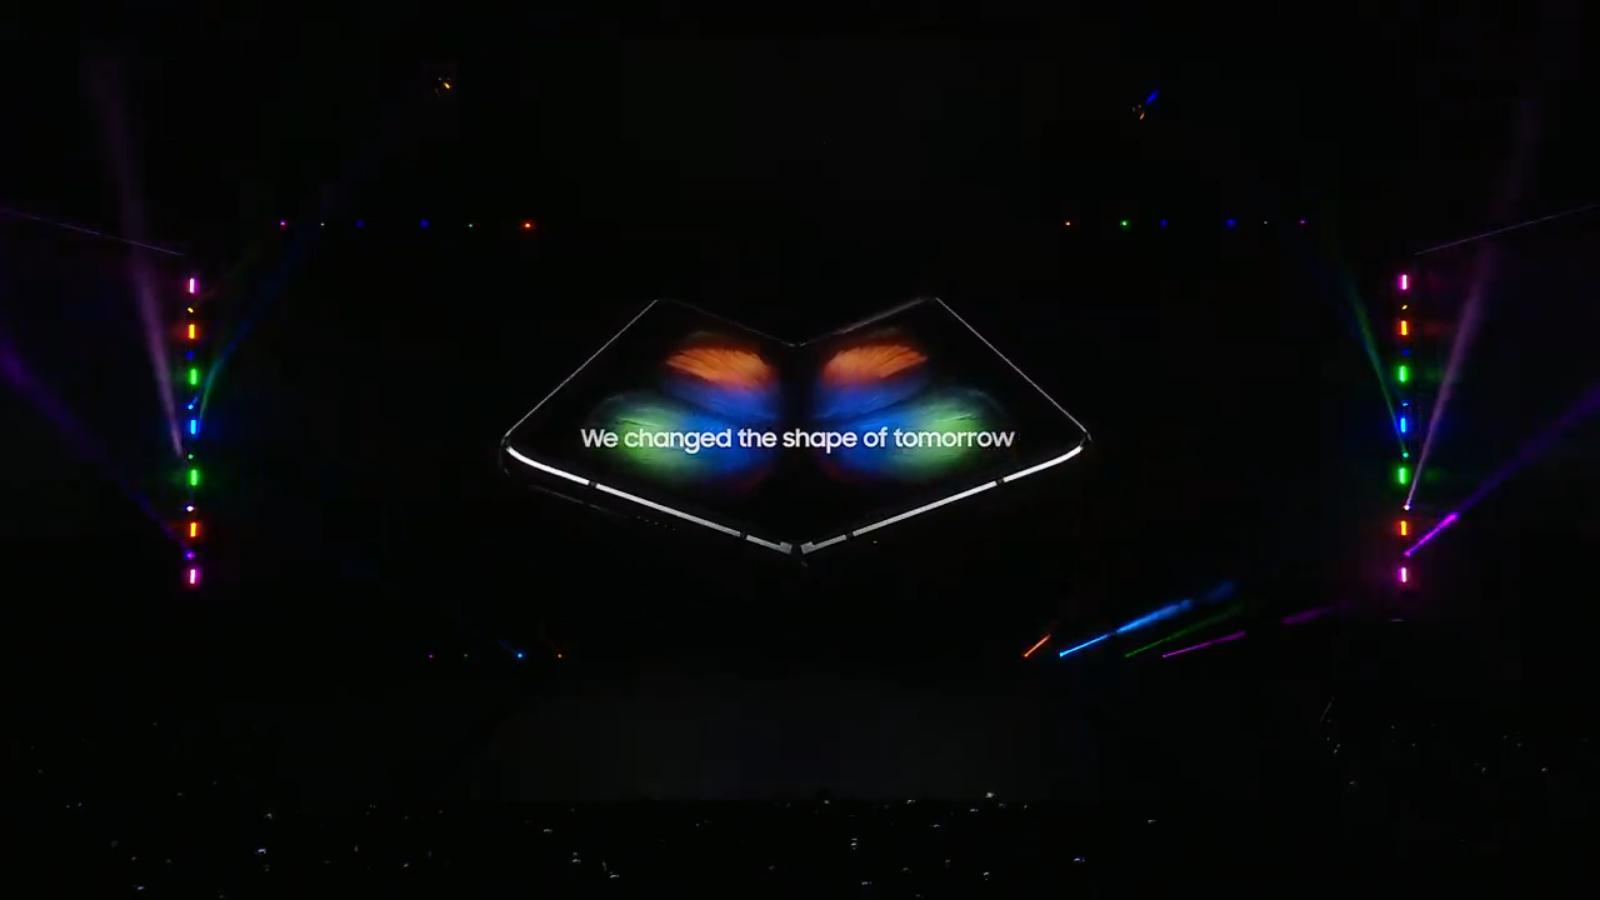 Samsung unveils the Galaxy Fold in San Francisco.